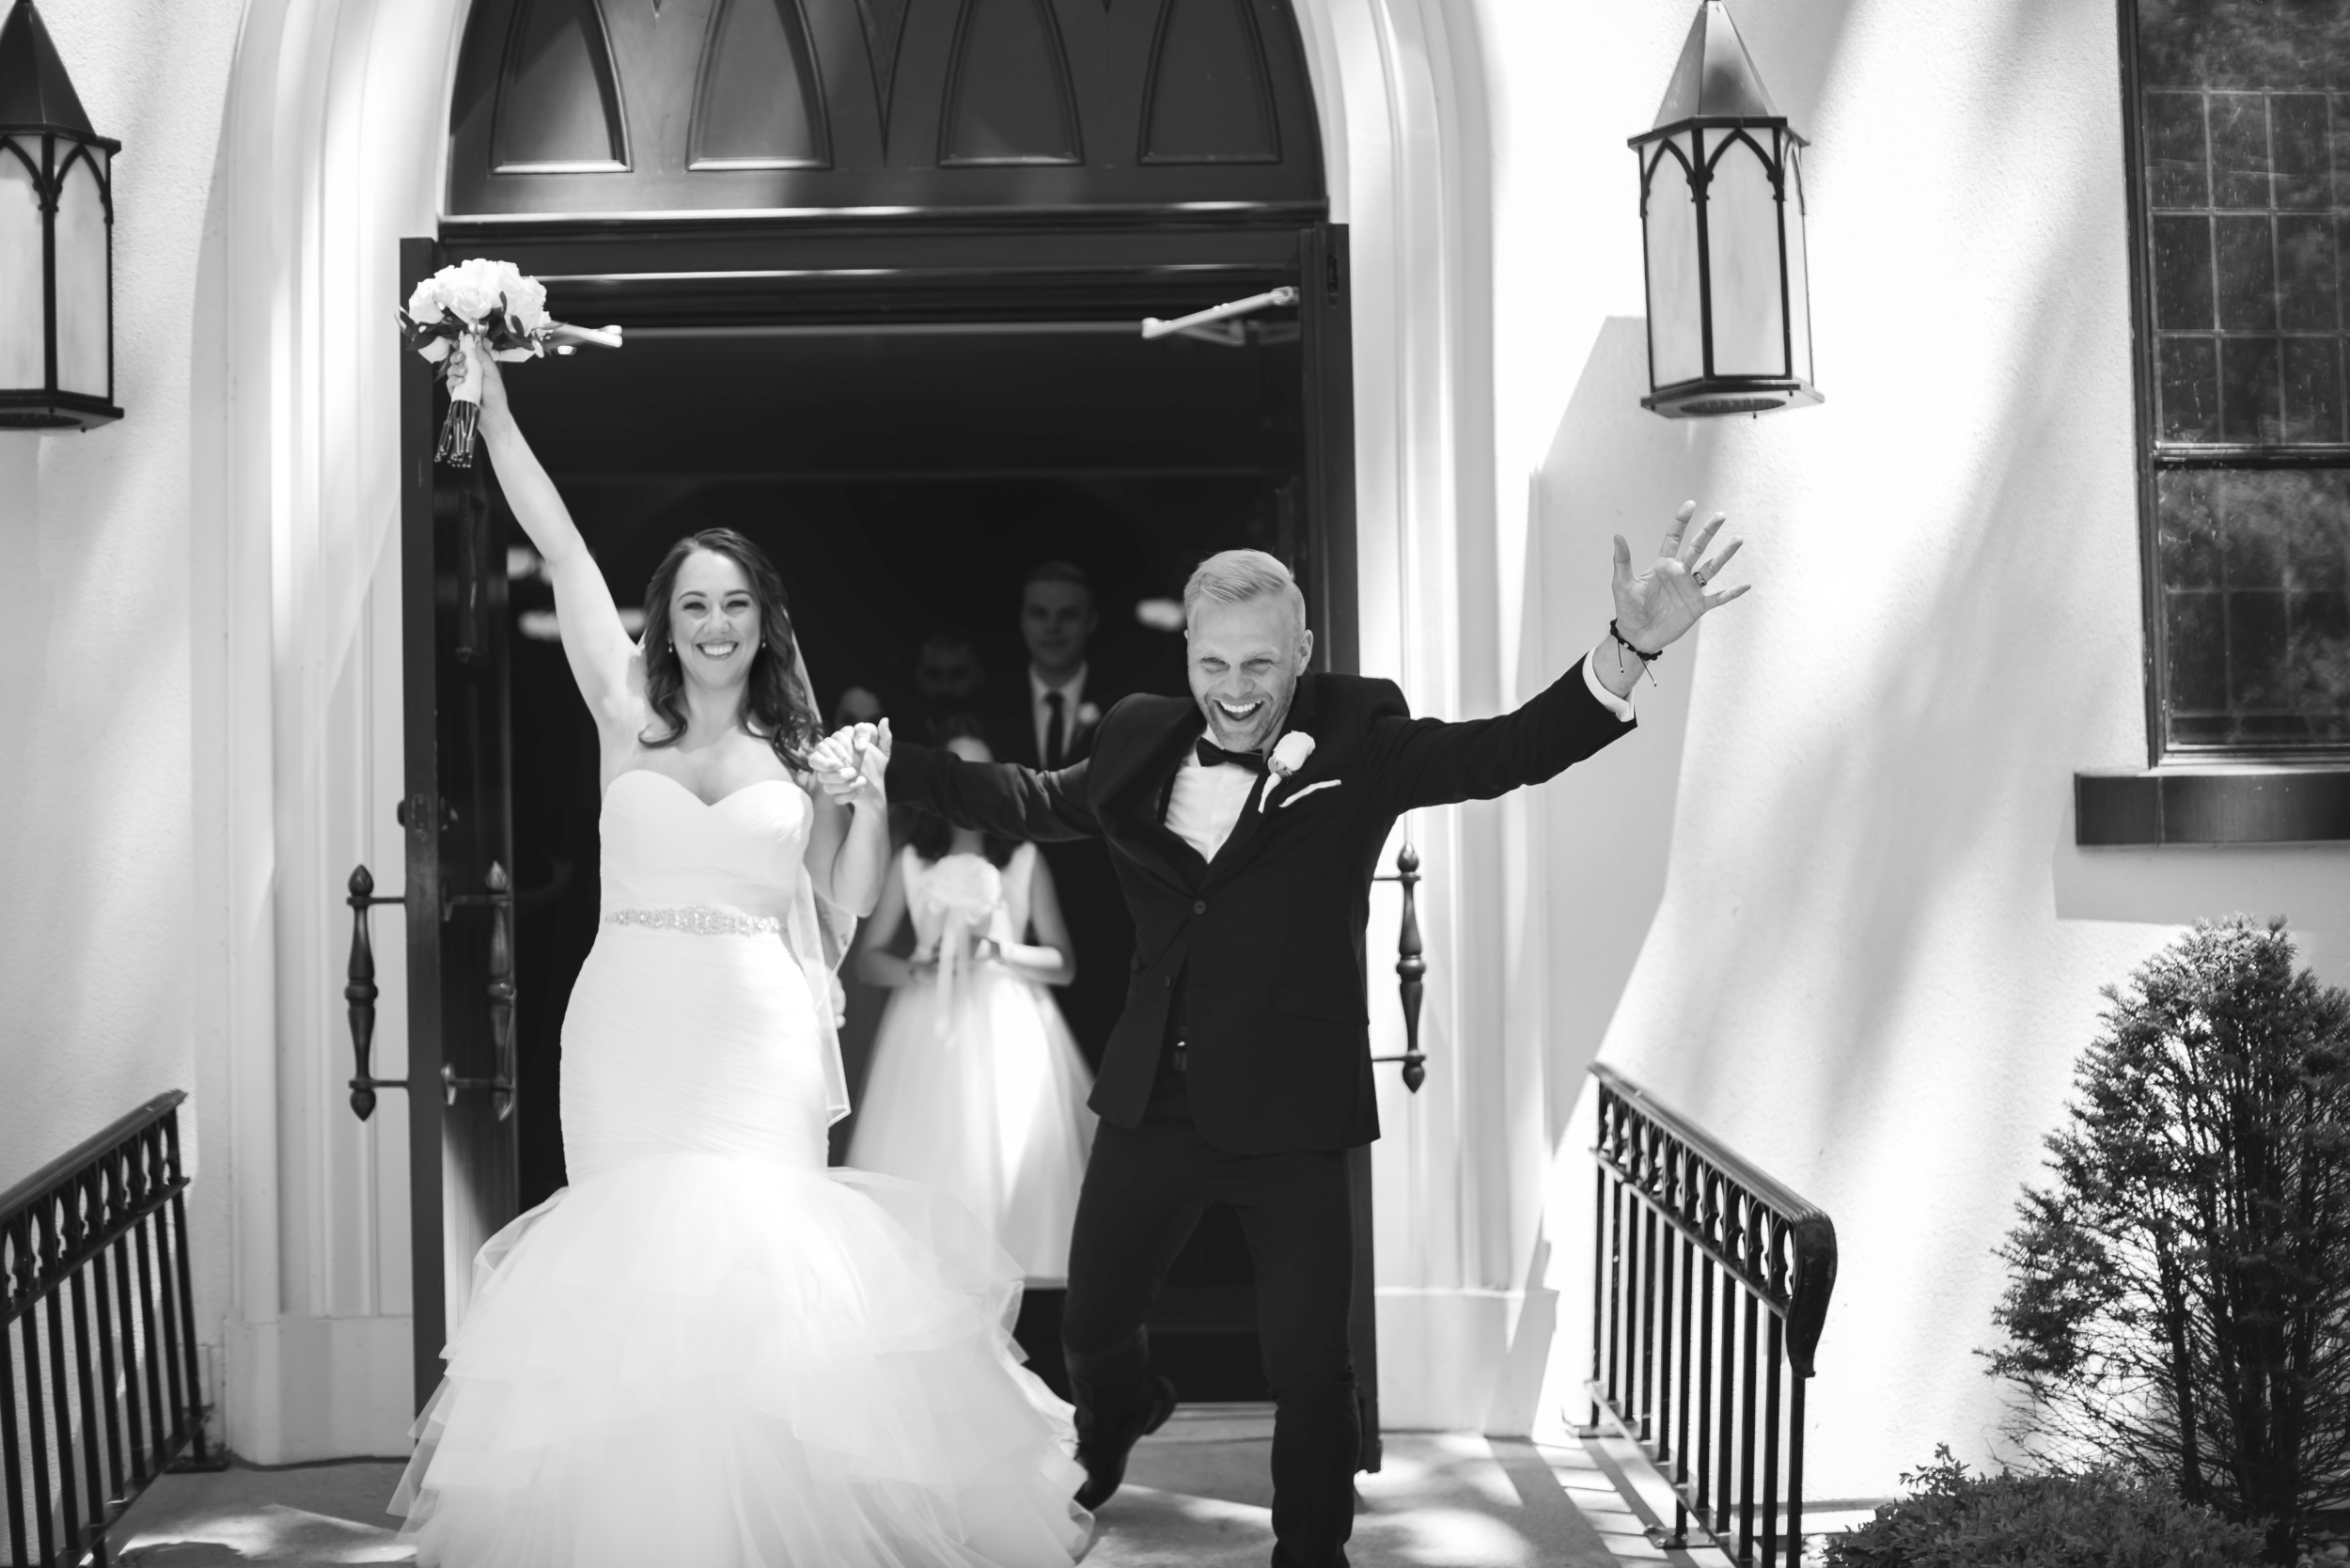 Wedding-Harbour-Banquet-Center-Oakville-Photographer-Wedding-Hamilton-Saint-James-Espresso-Downtown-HamOnt-GTA-Niagara-Toronto-Moments-by-Lauren-Photography-Photo-Image-19.png